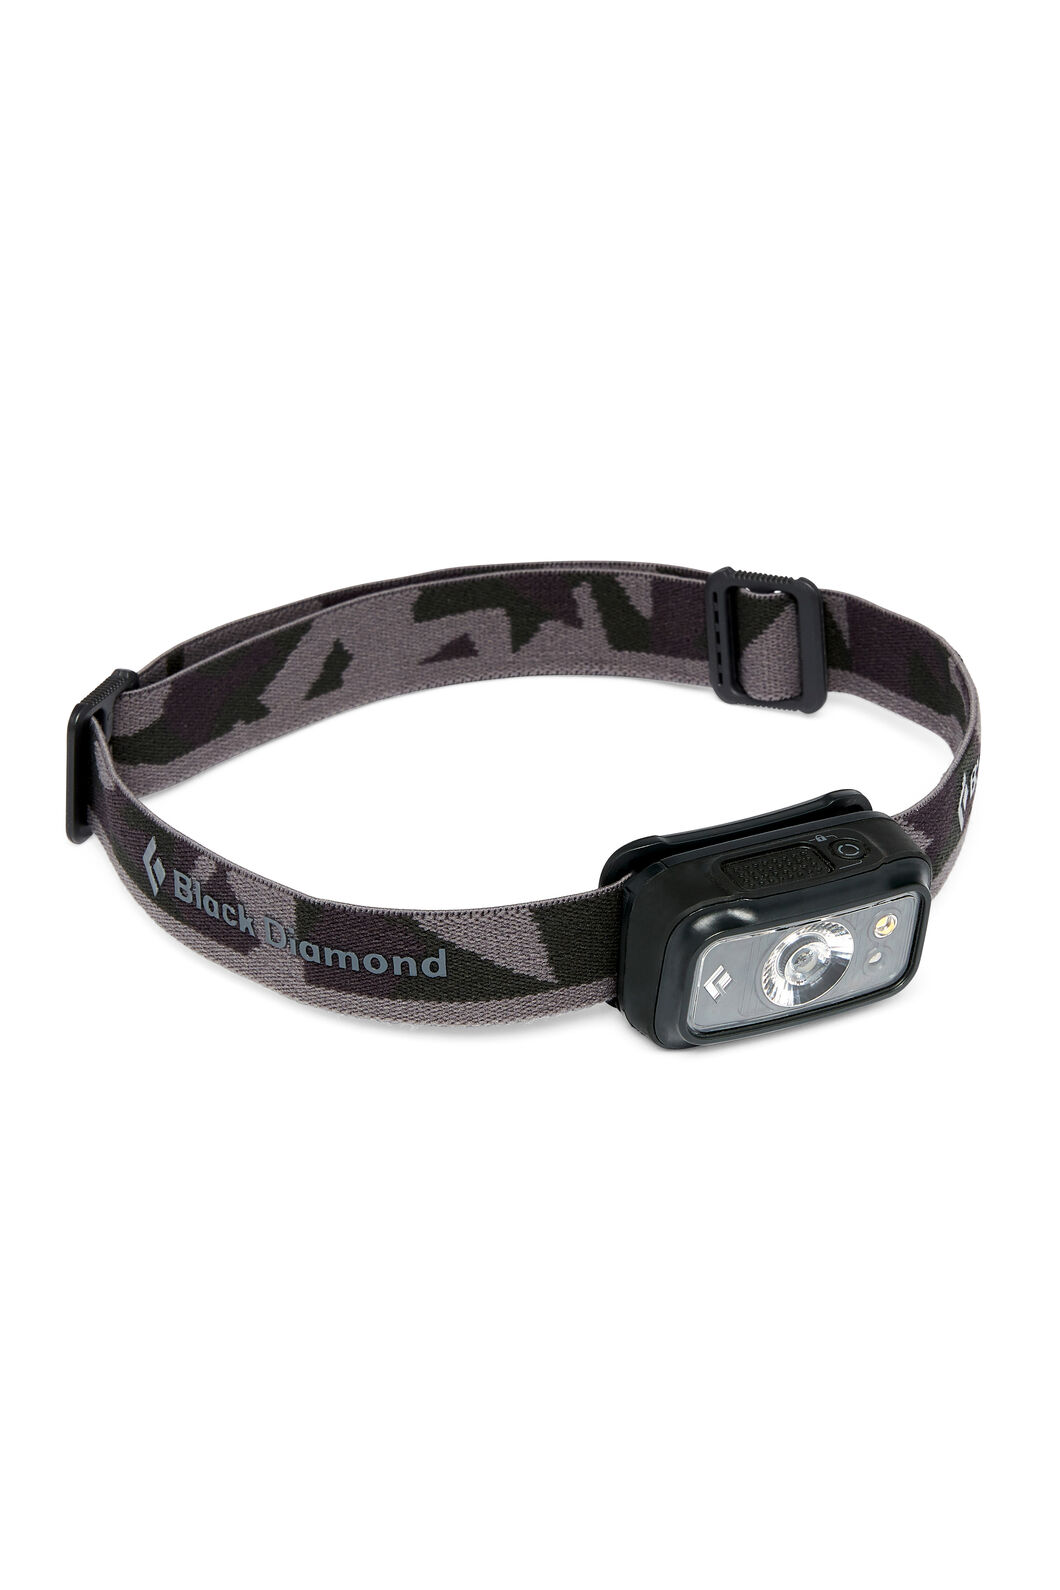 Black Diamond Cosmo 300 Headlamp, Black, hi-res